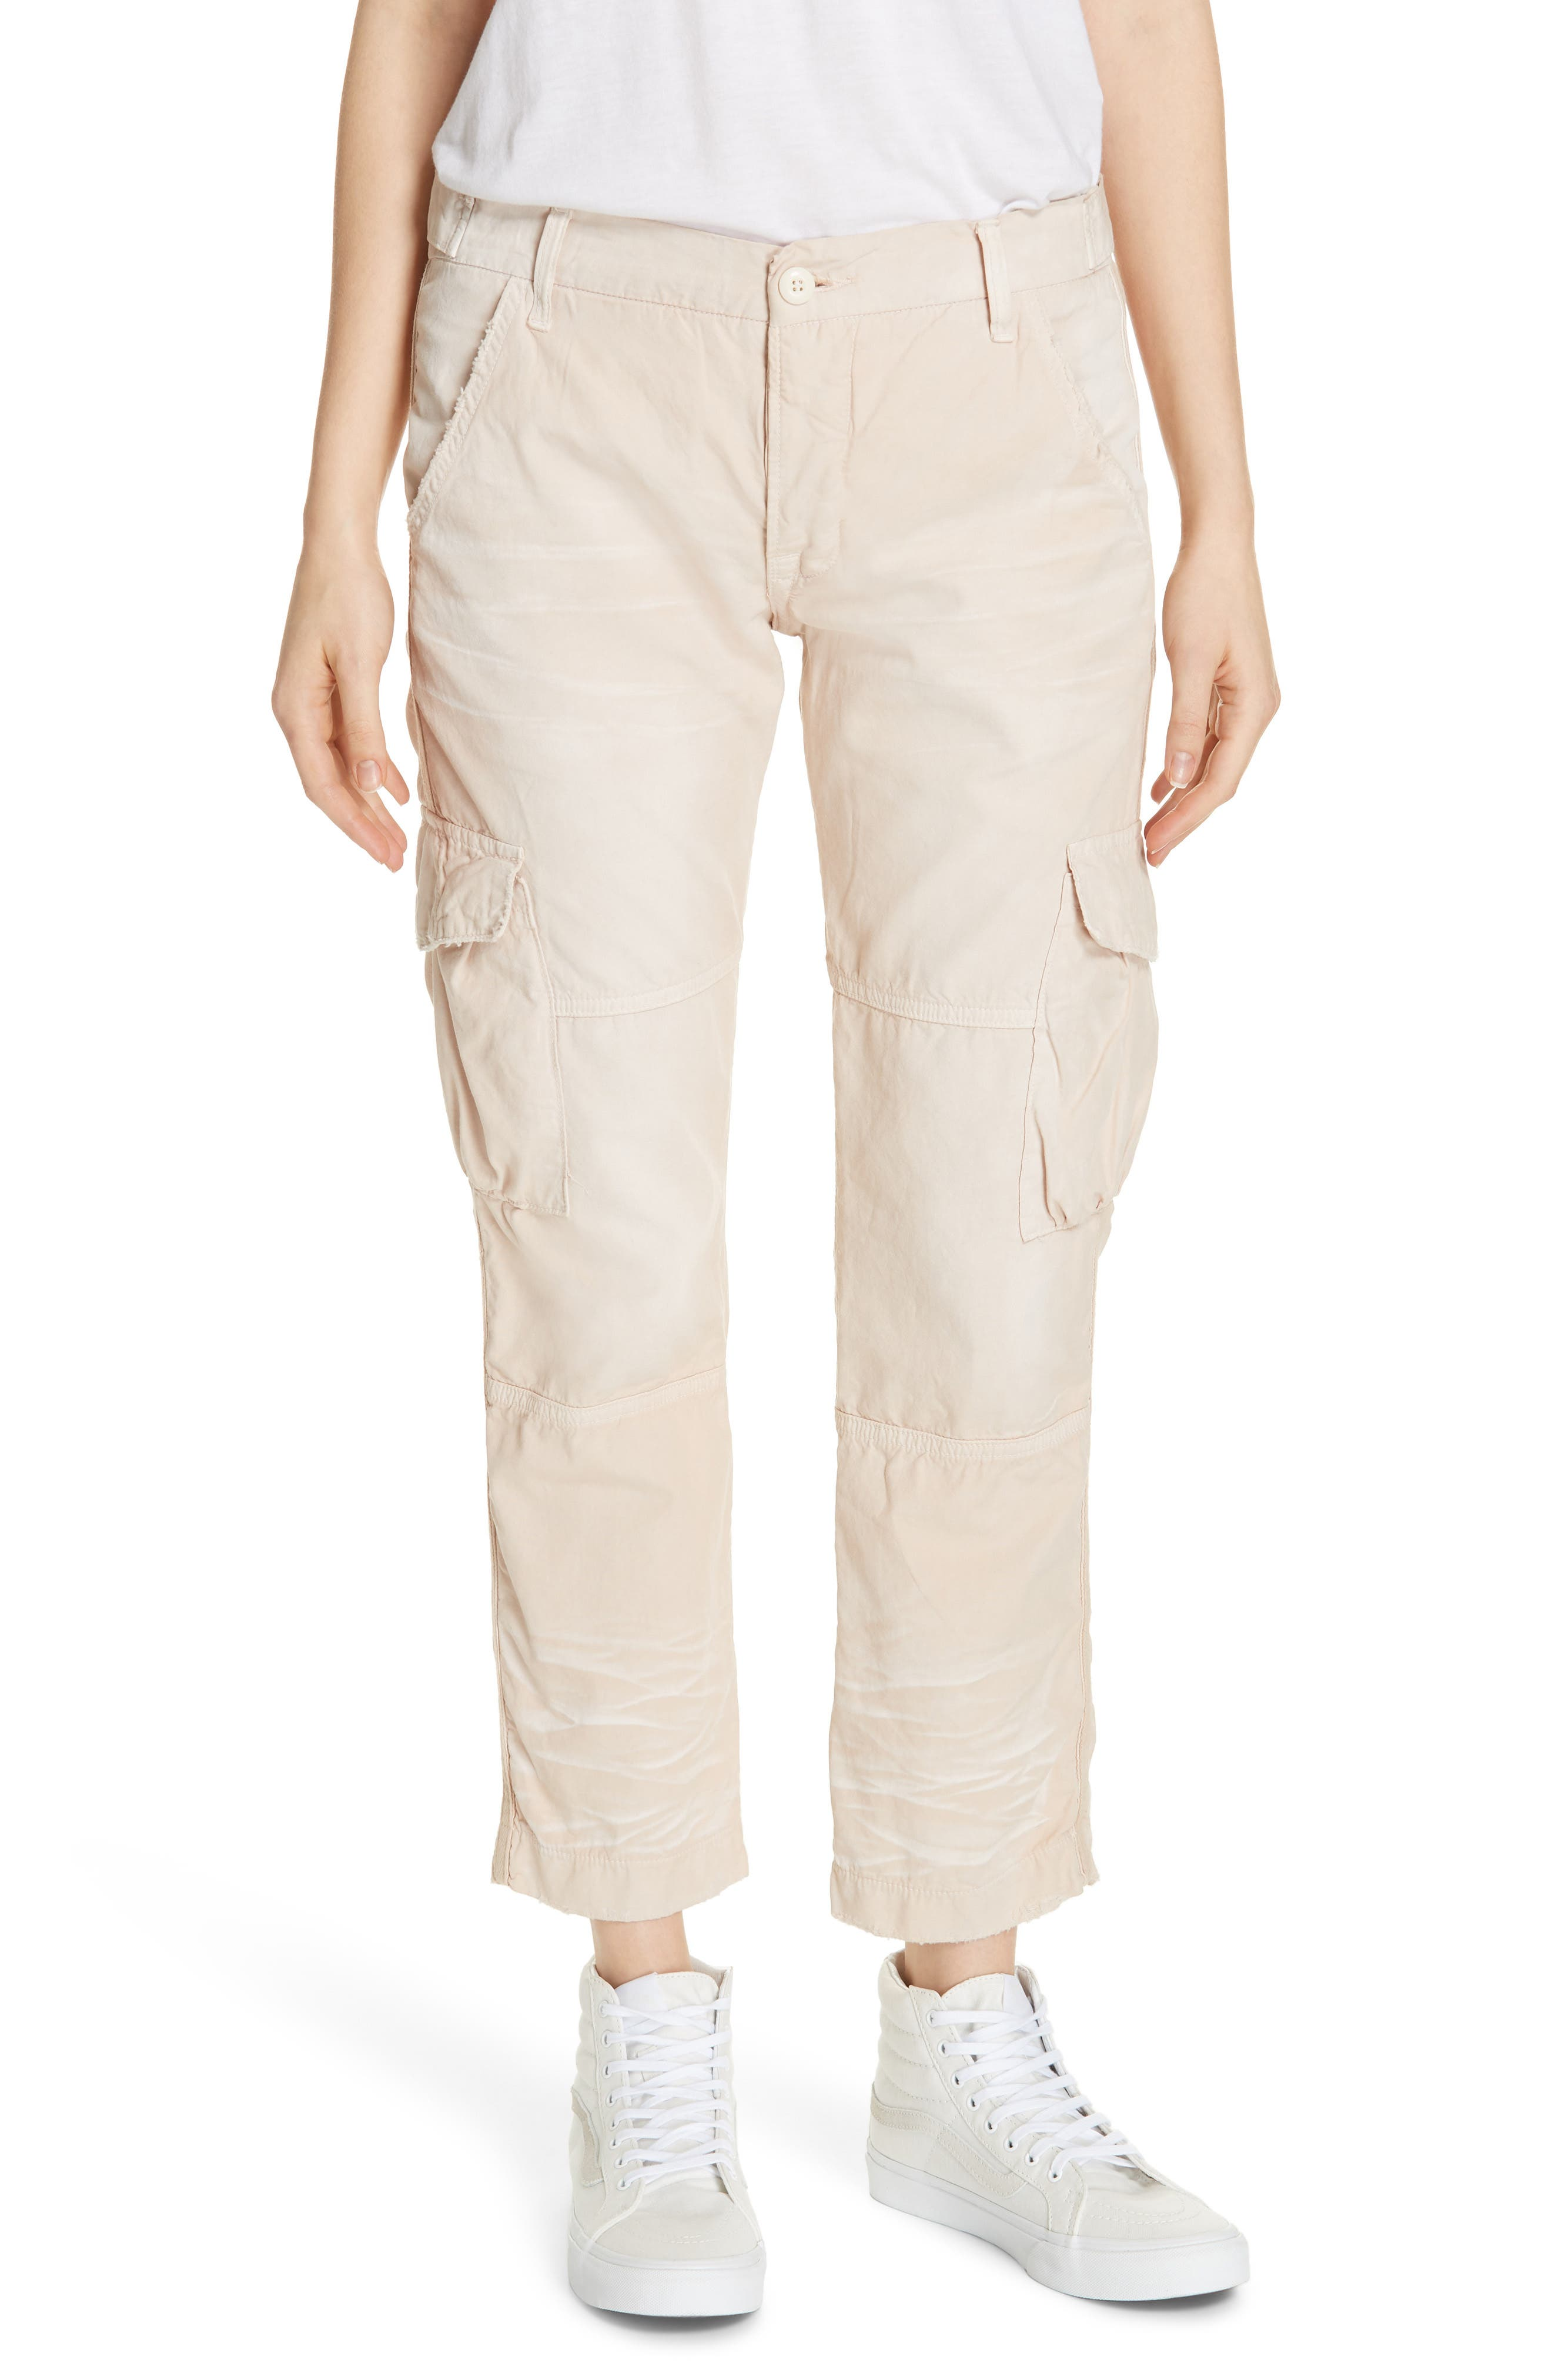 Nsf Clothing Basquiat Cargo Pants, Beige